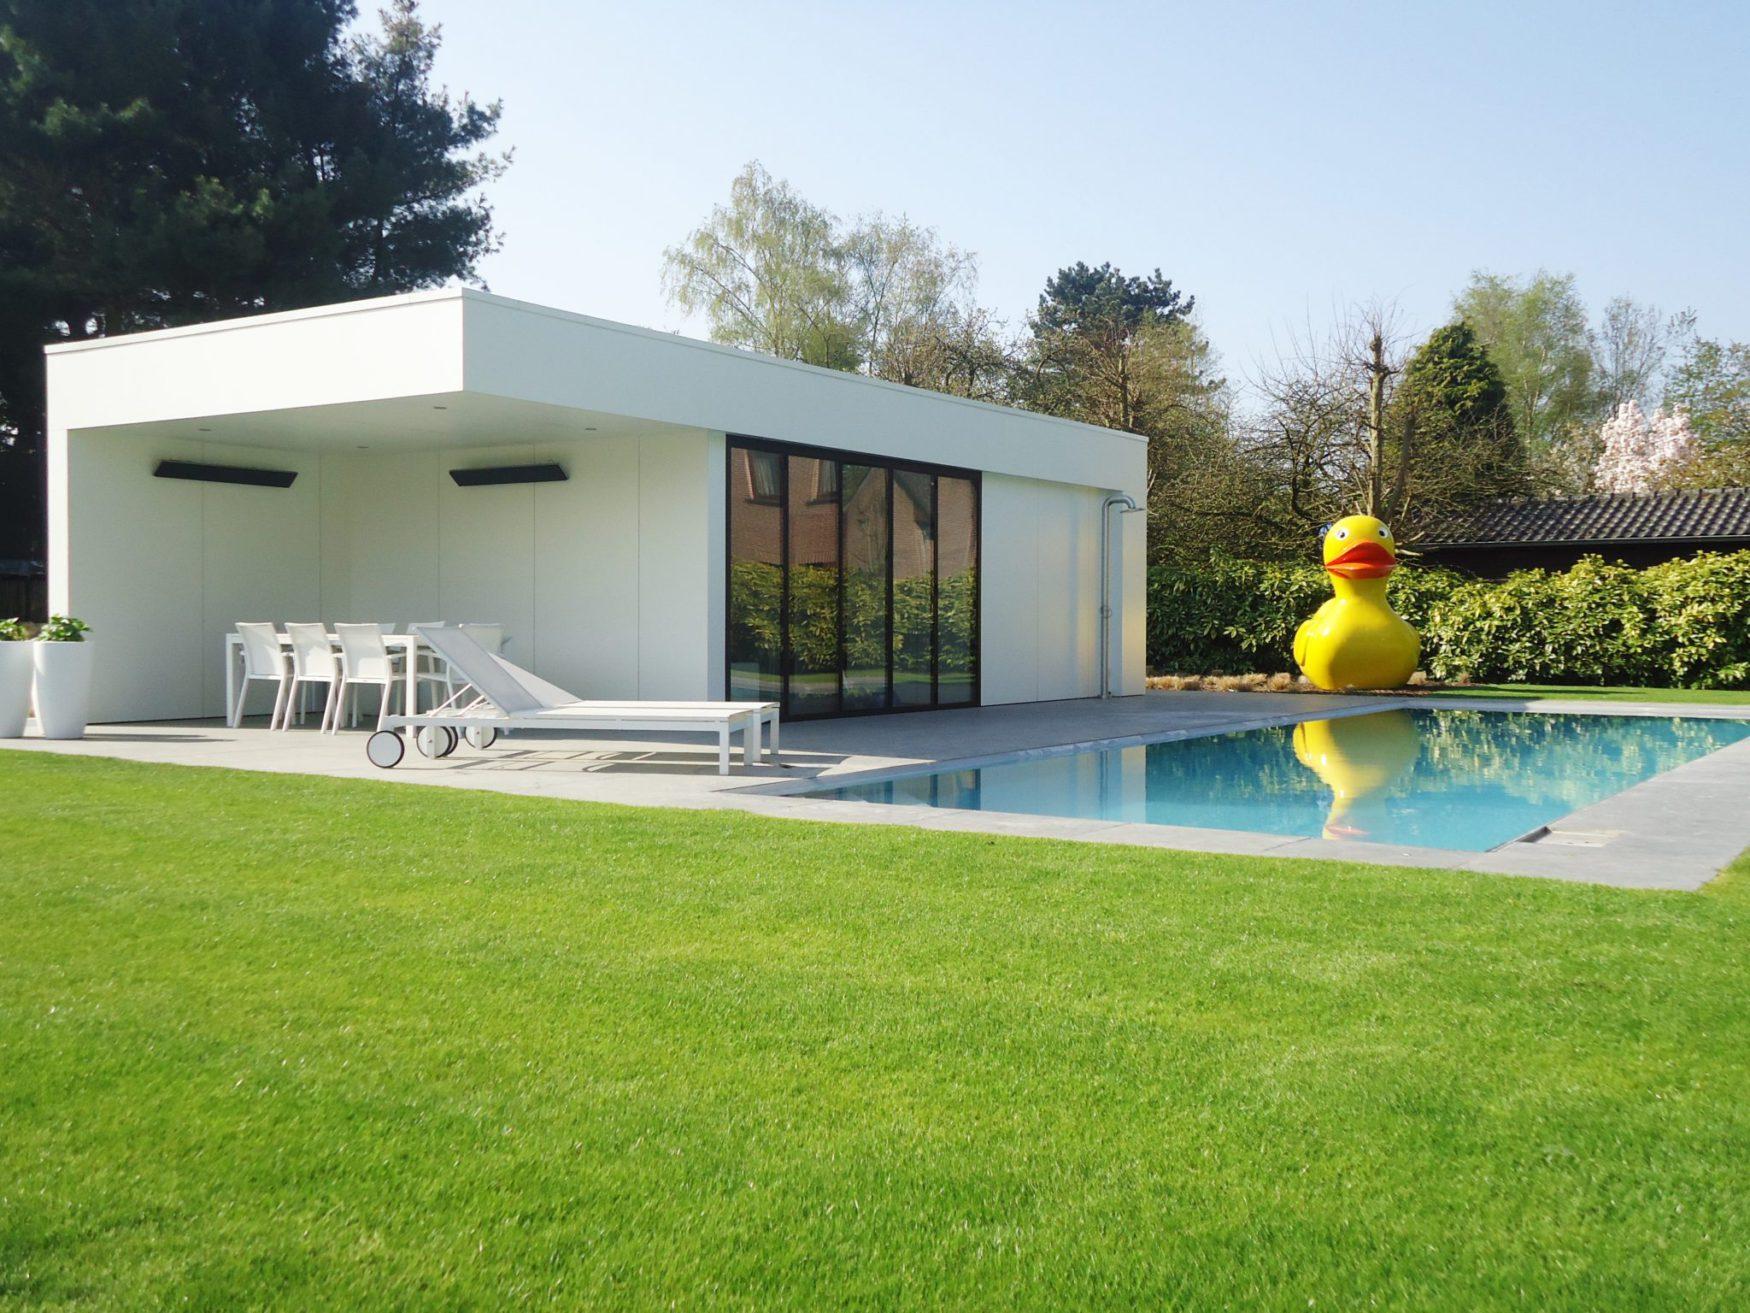 moderne poolhouse met bijpassende keuken inloopdouche en toilet ref wit mp01 vanhauwood. Black Bedroom Furniture Sets. Home Design Ideas